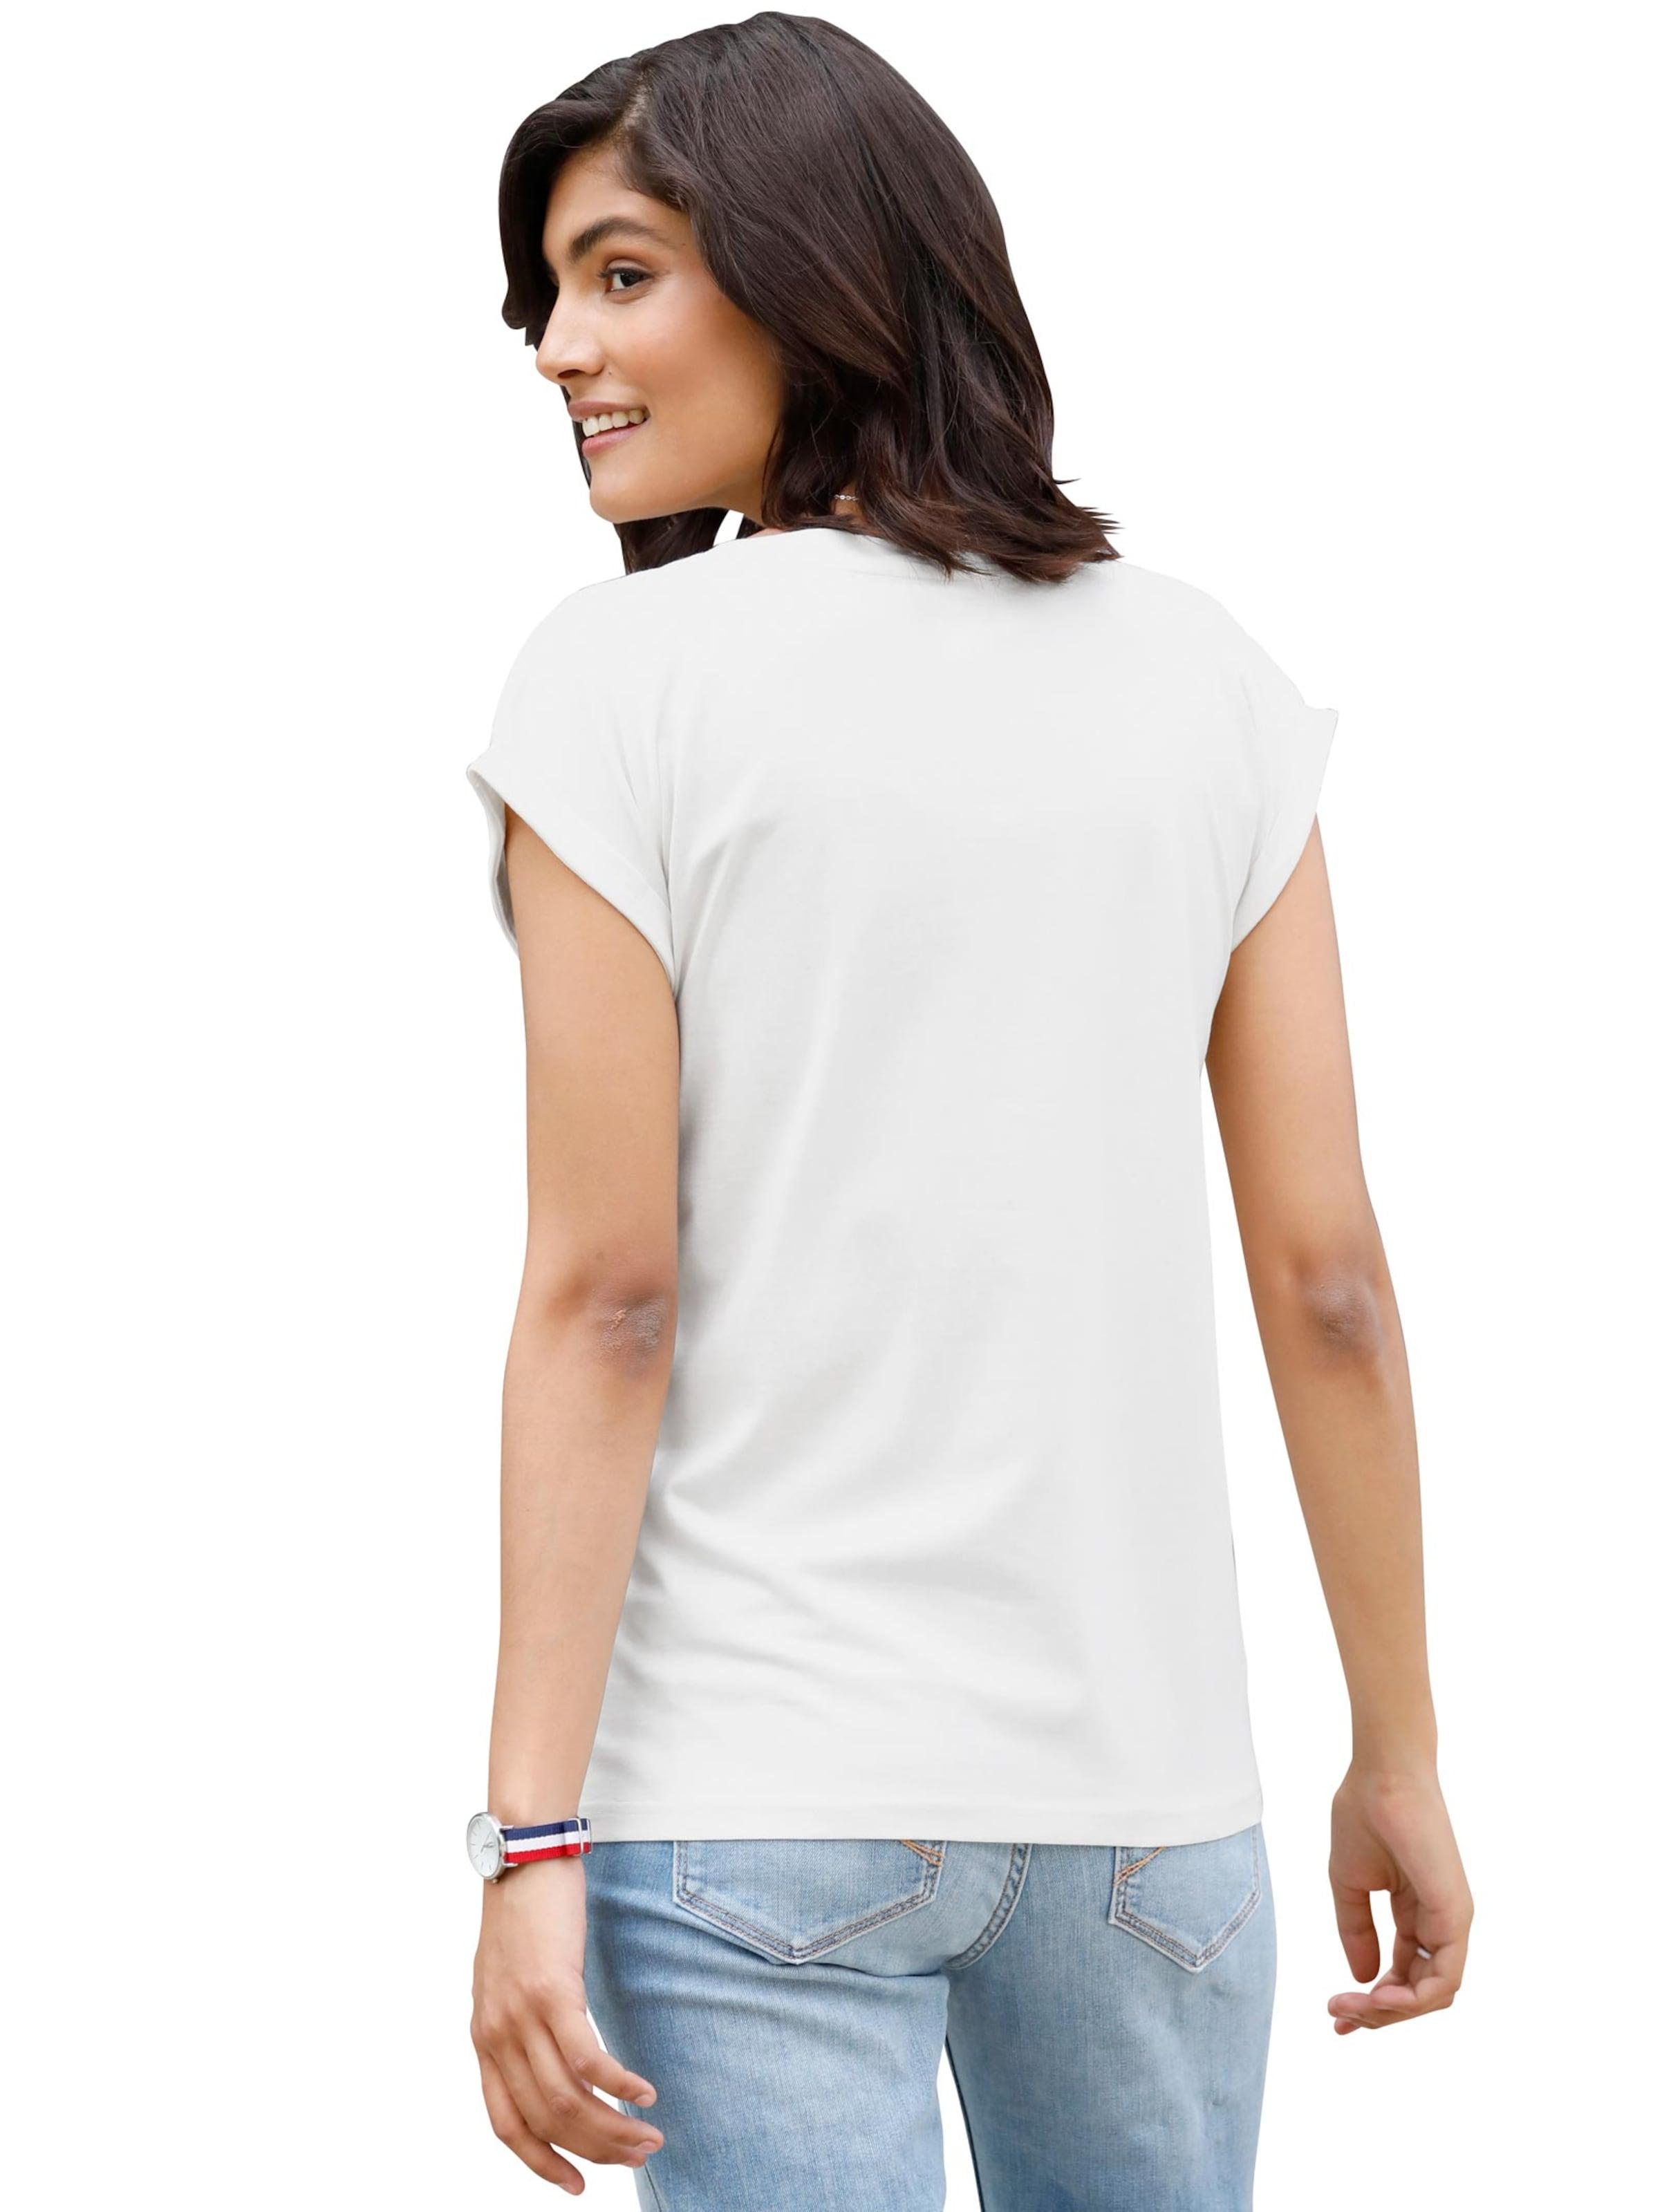 Damen Shirt ecru